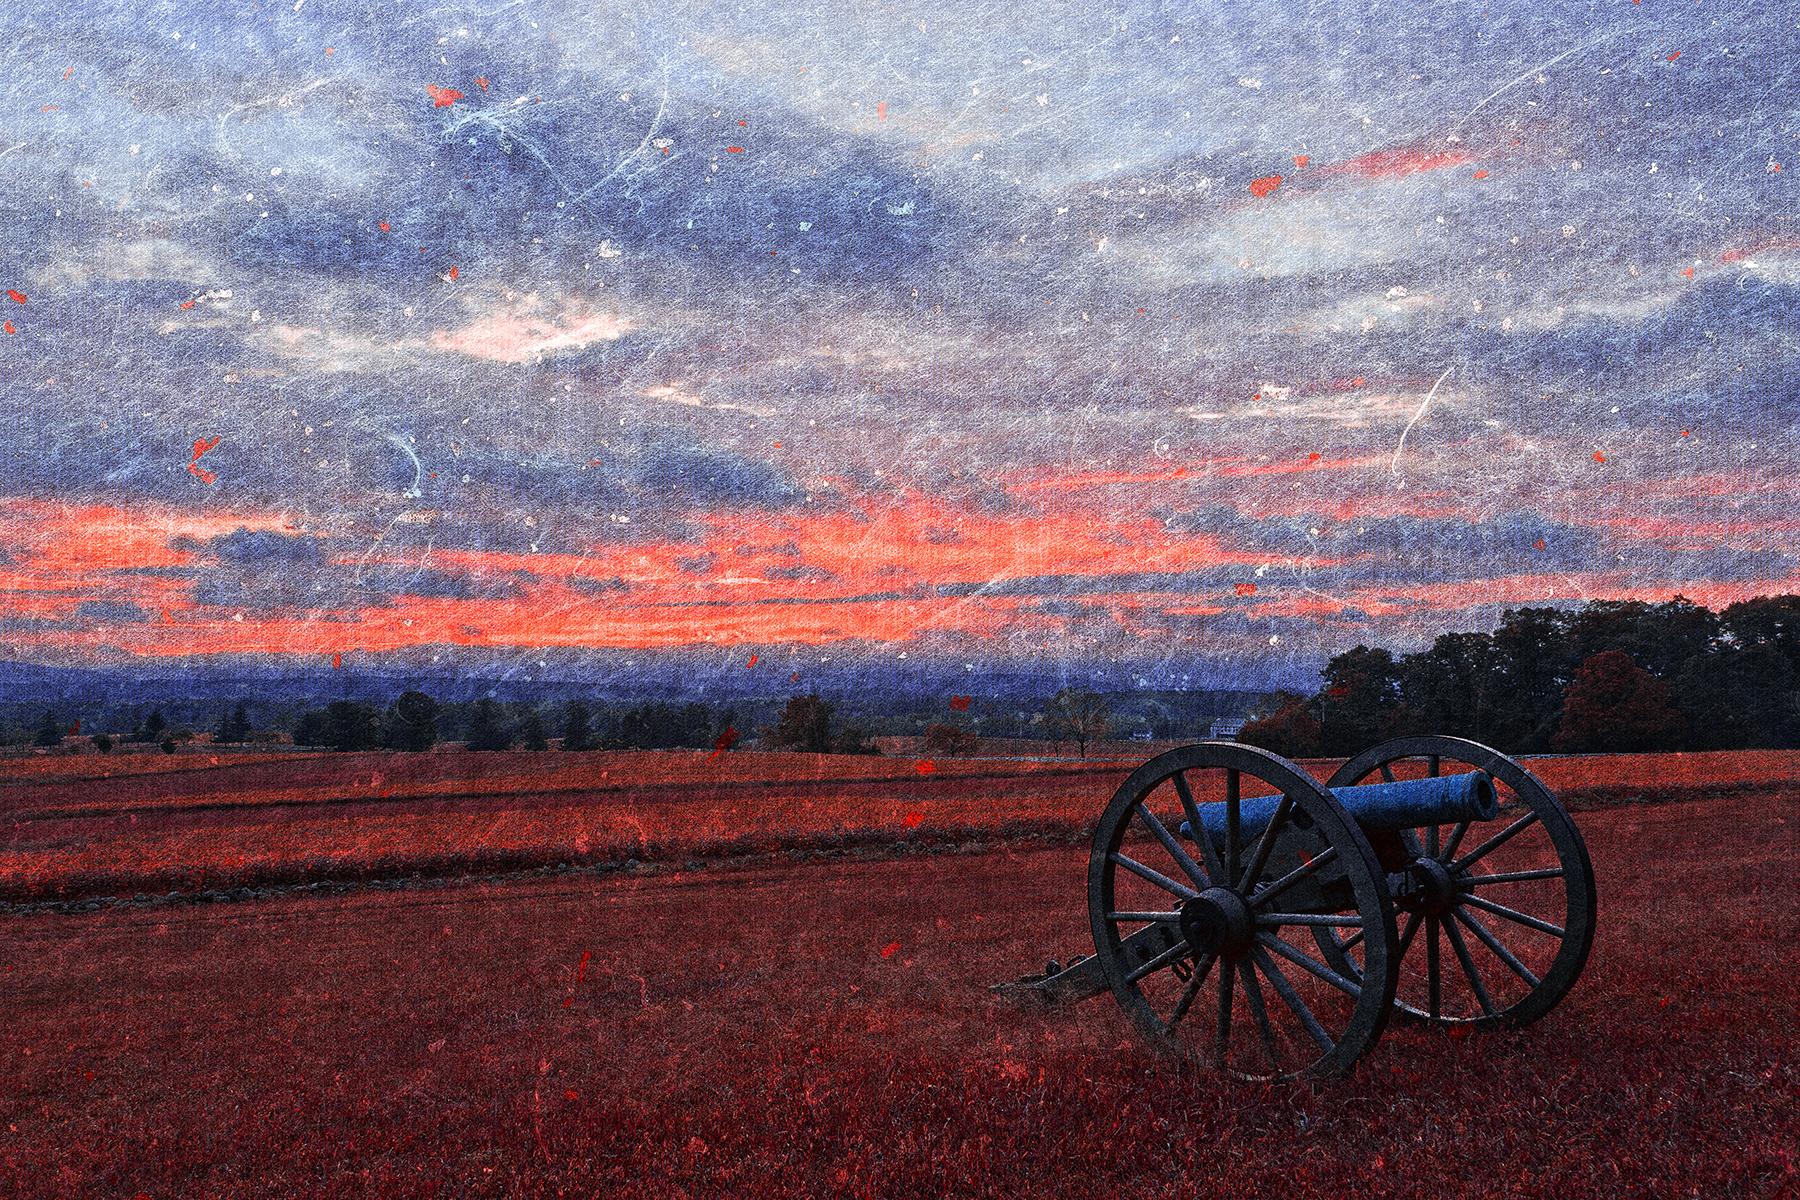 Gettysburg cannon sunset - ruby rapture photo